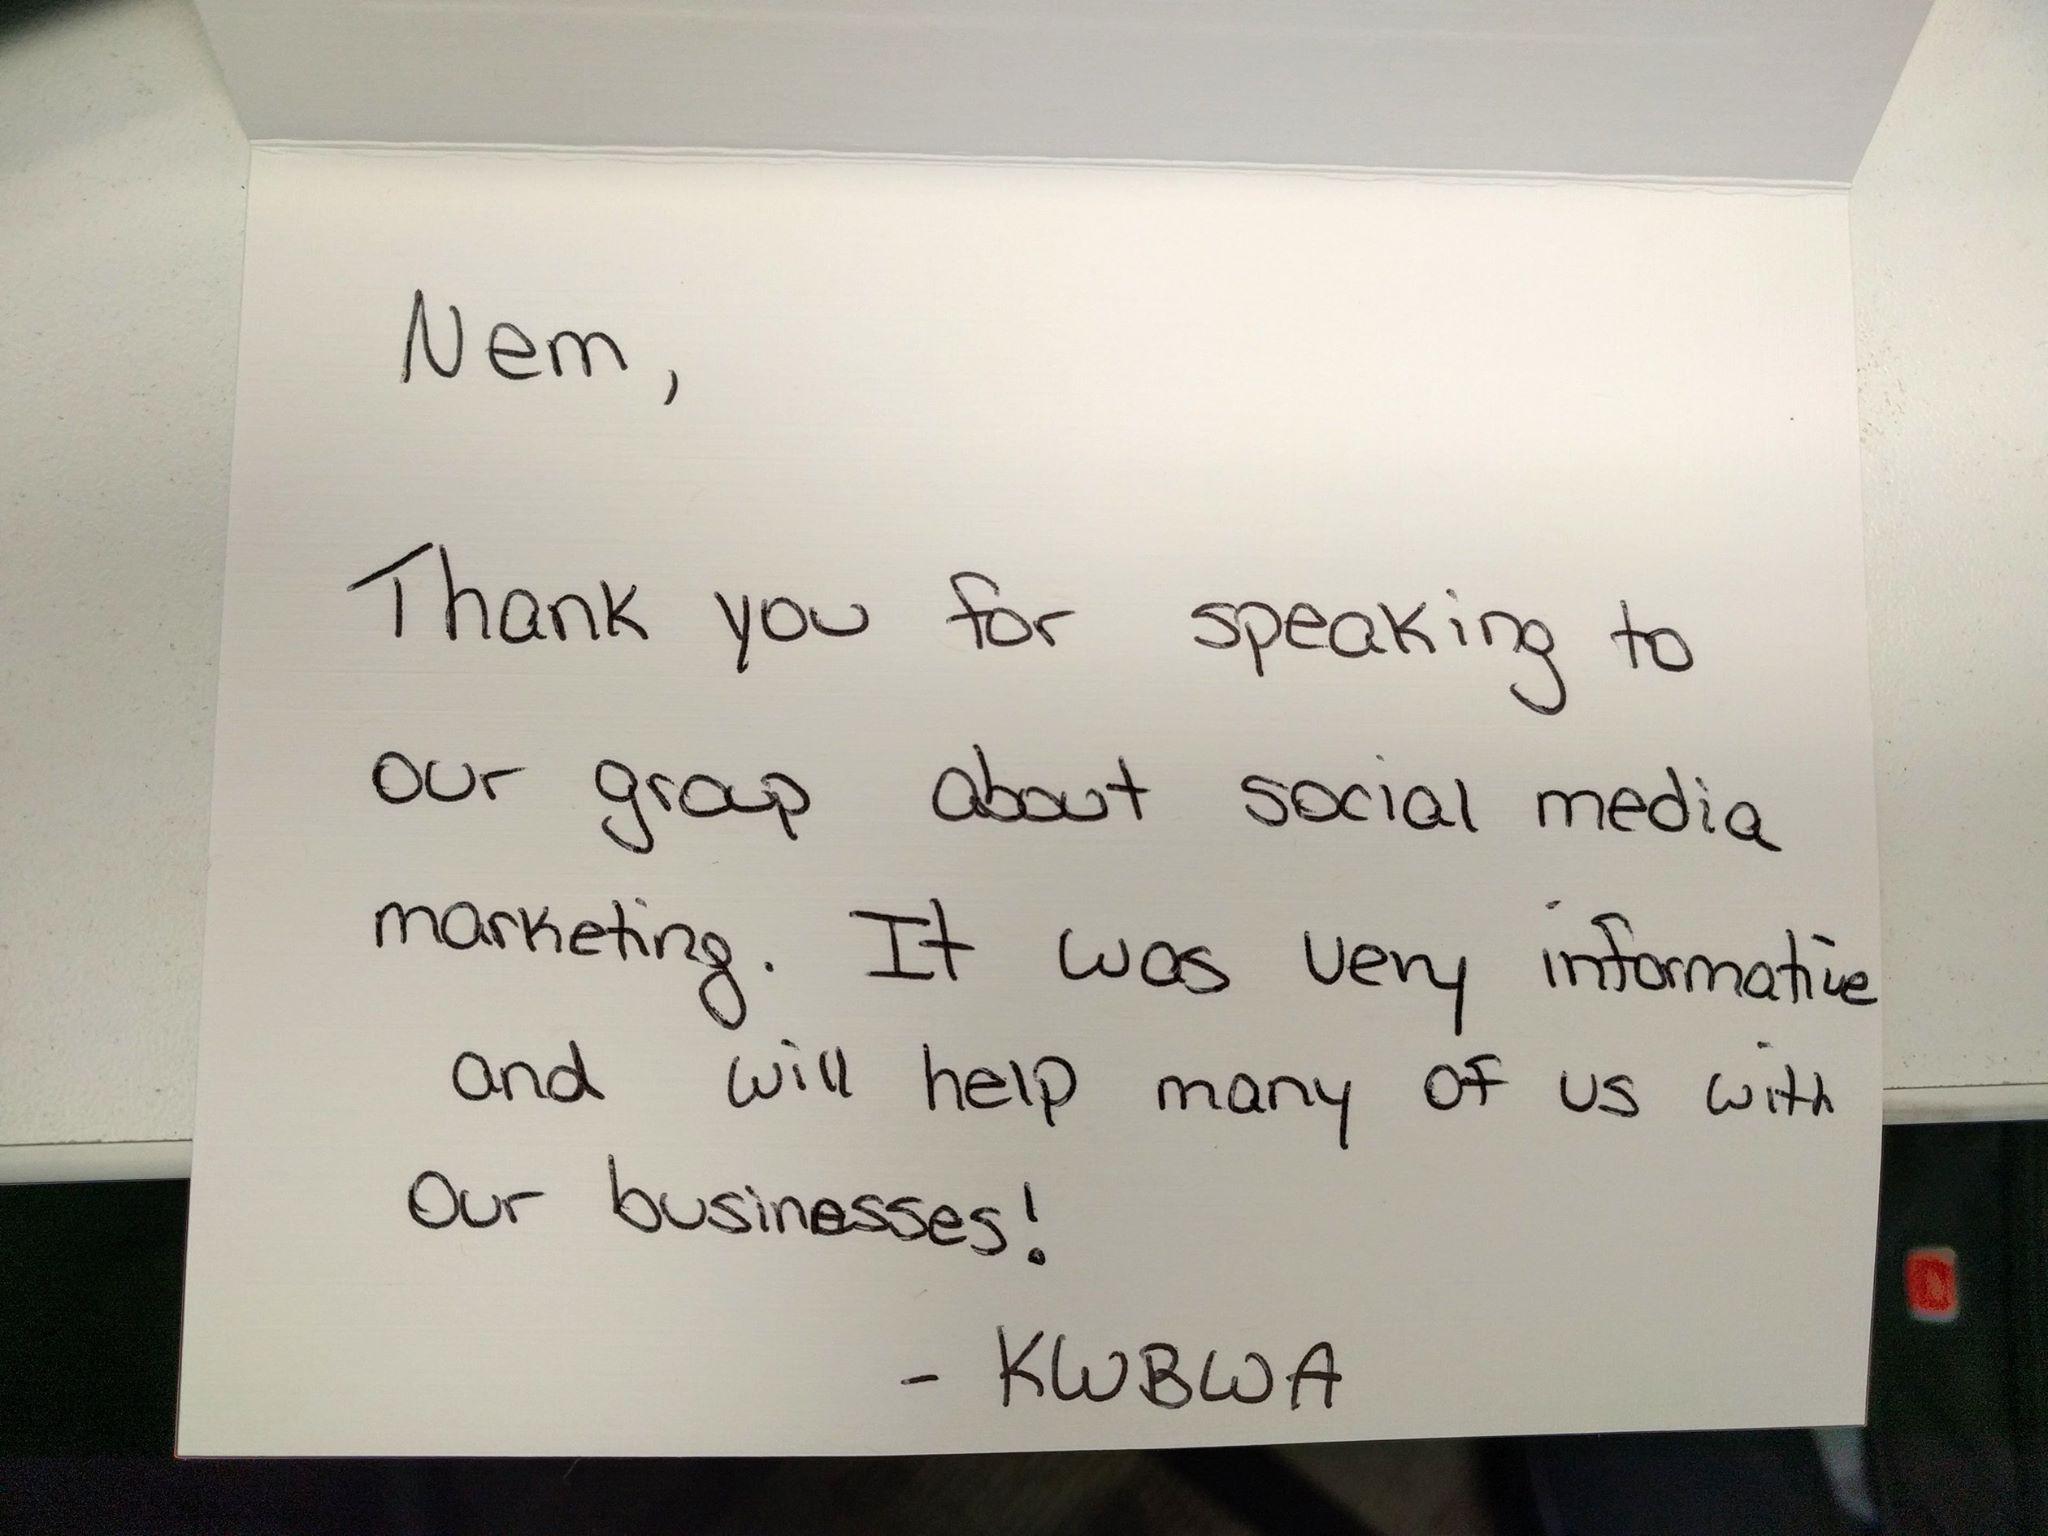 Digital Marketing Speaker: KWBWA Note